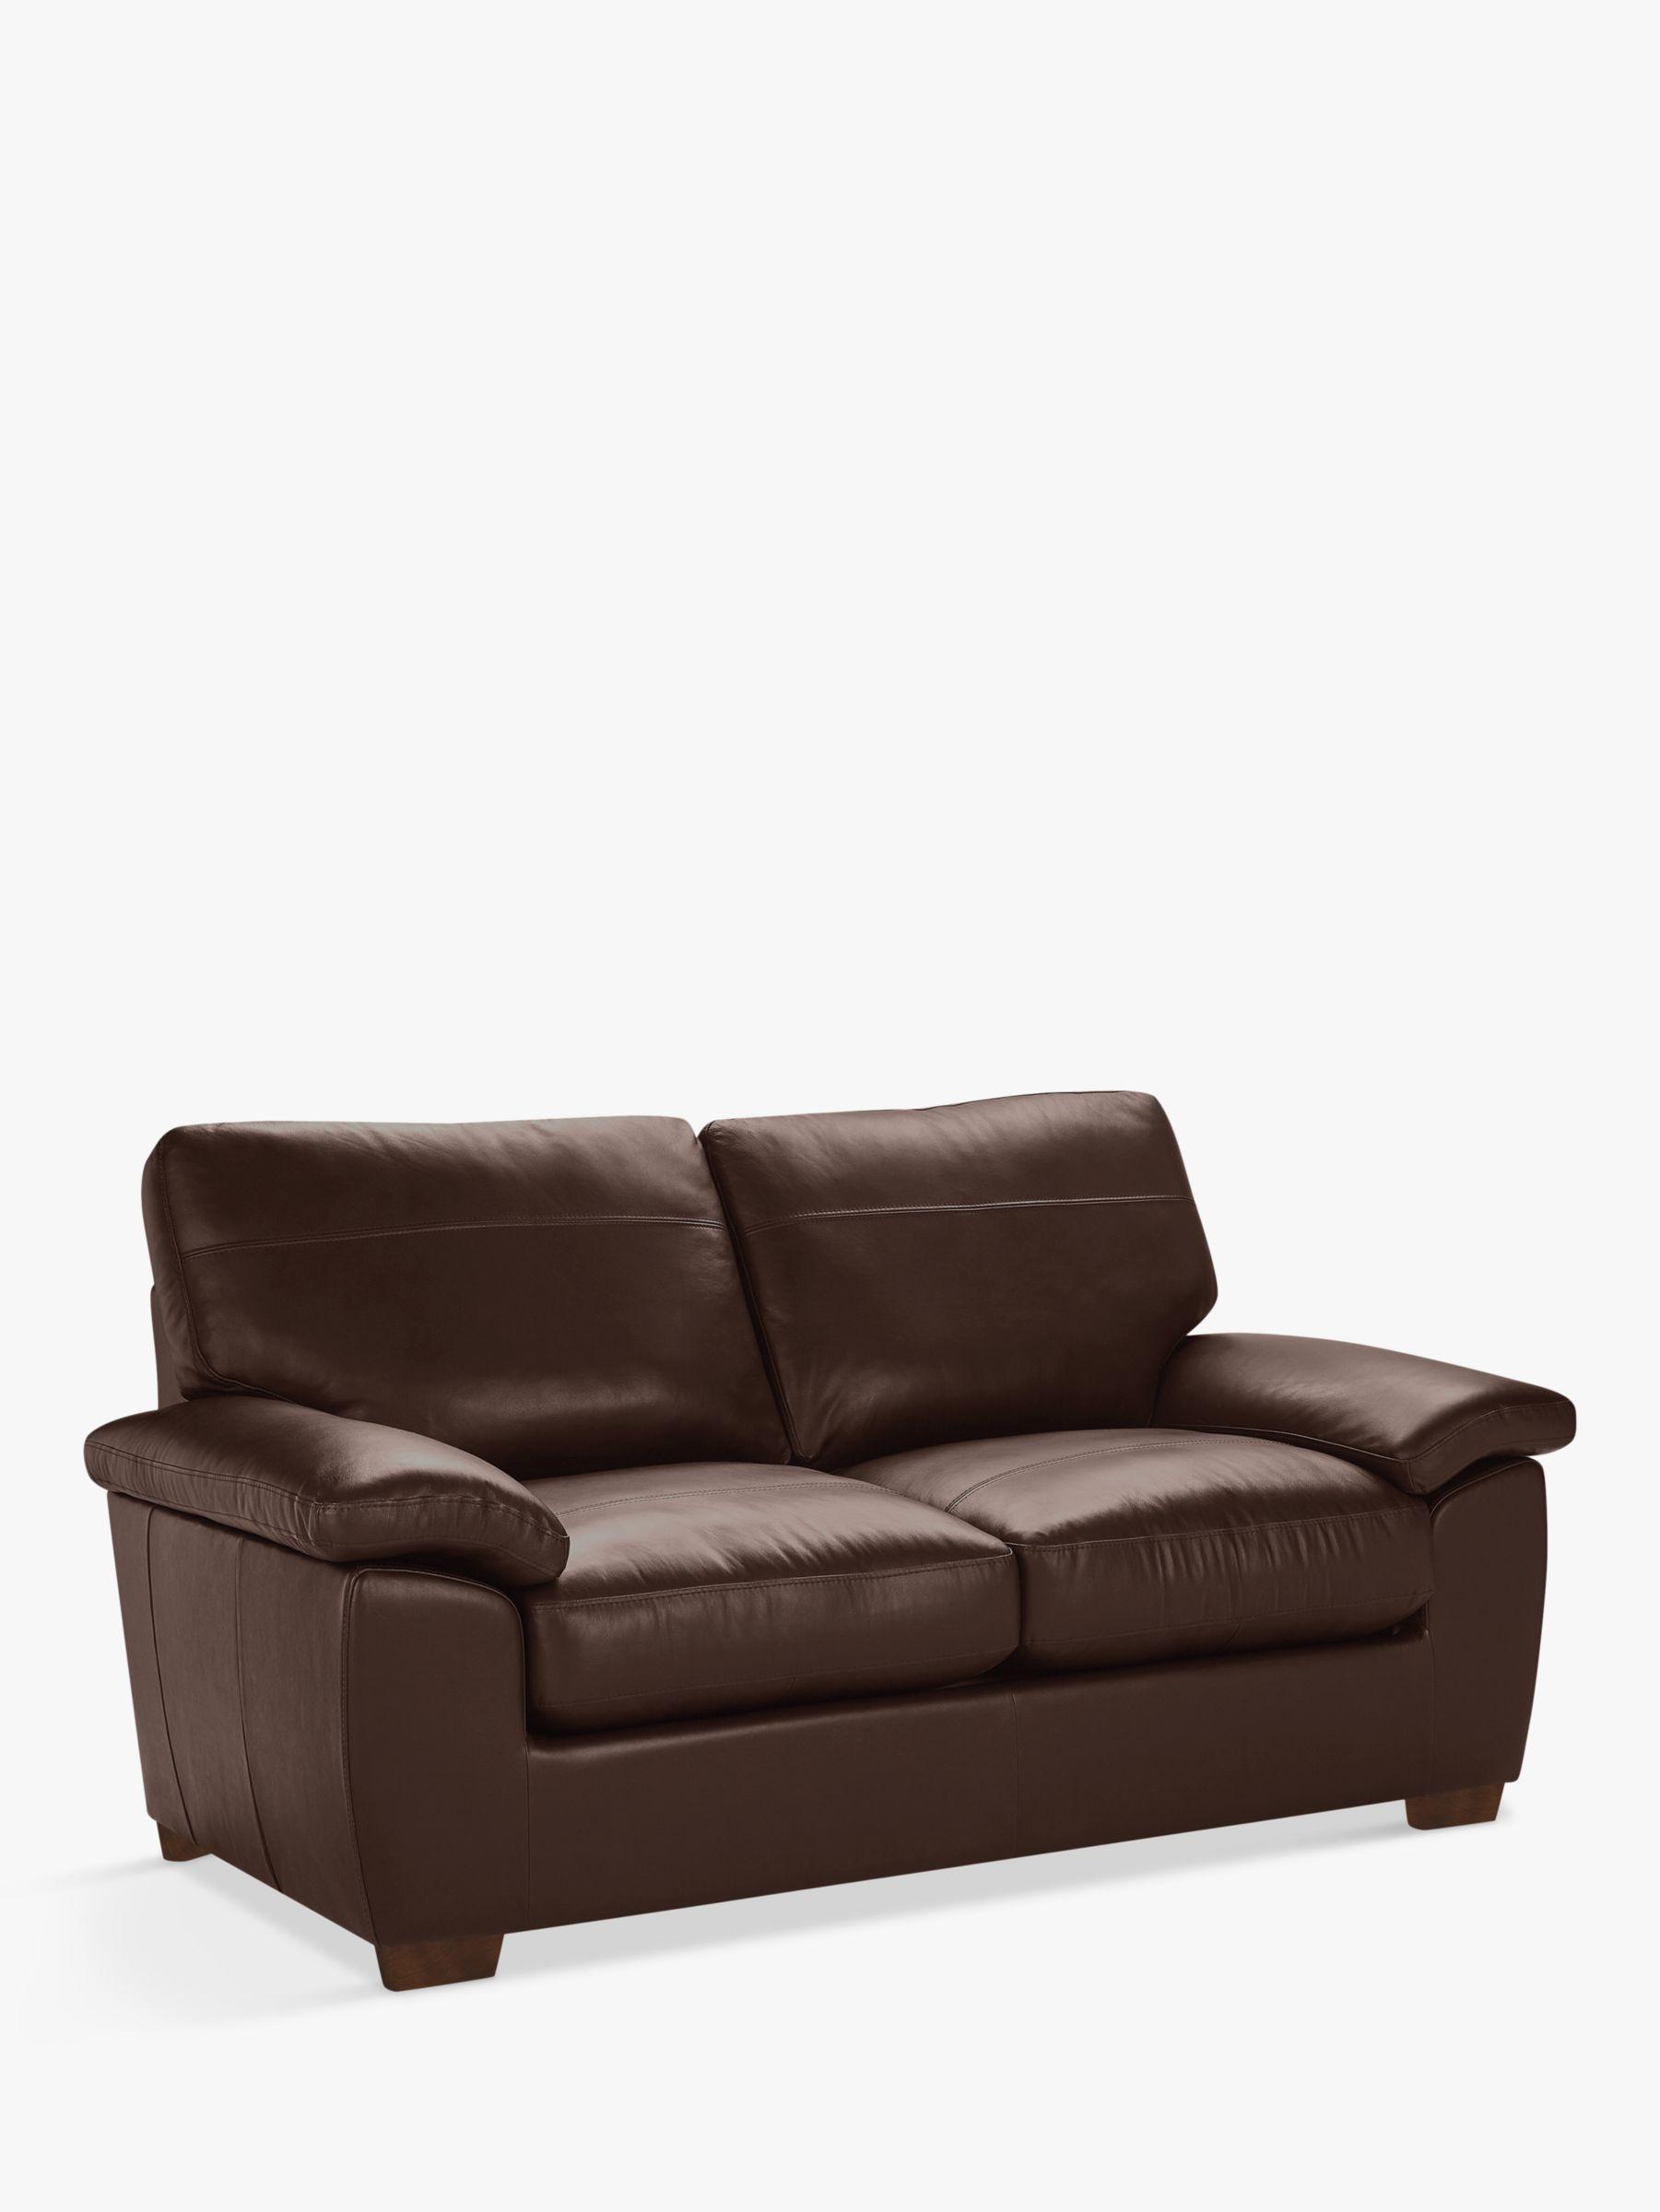 John Lewis Partners Camden Medium 2 Seater Leather Sofa Dark Leg Nature Brown At John Lewis Partners